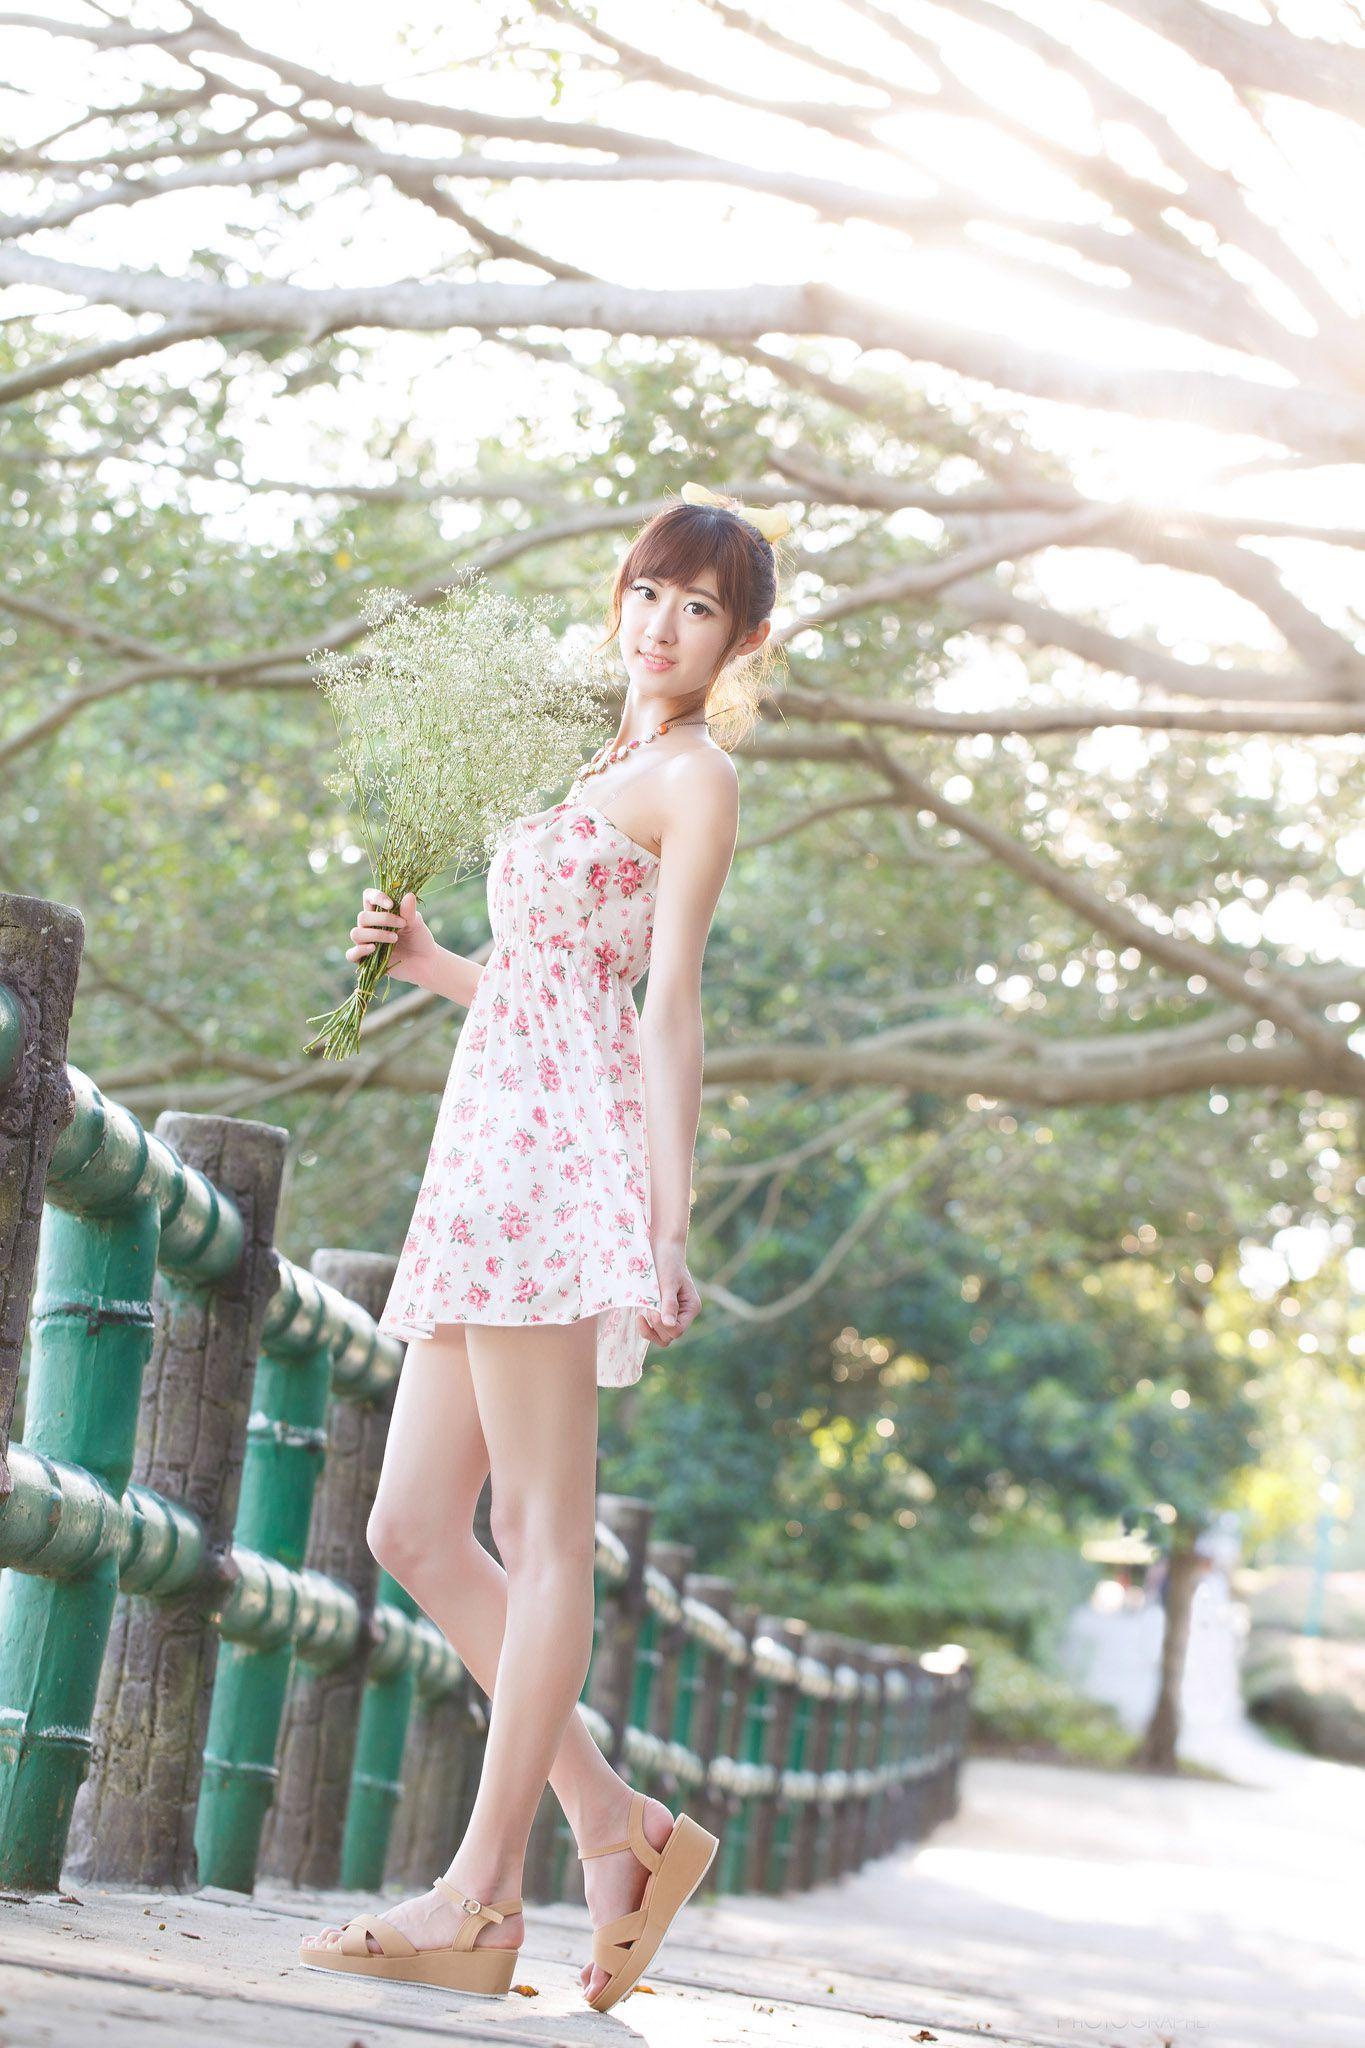 VOL.1848 [台湾正妹]甜美清新唯美正妹户外美女:林茉晶(腿模Queena)高品质写真套图(59P)